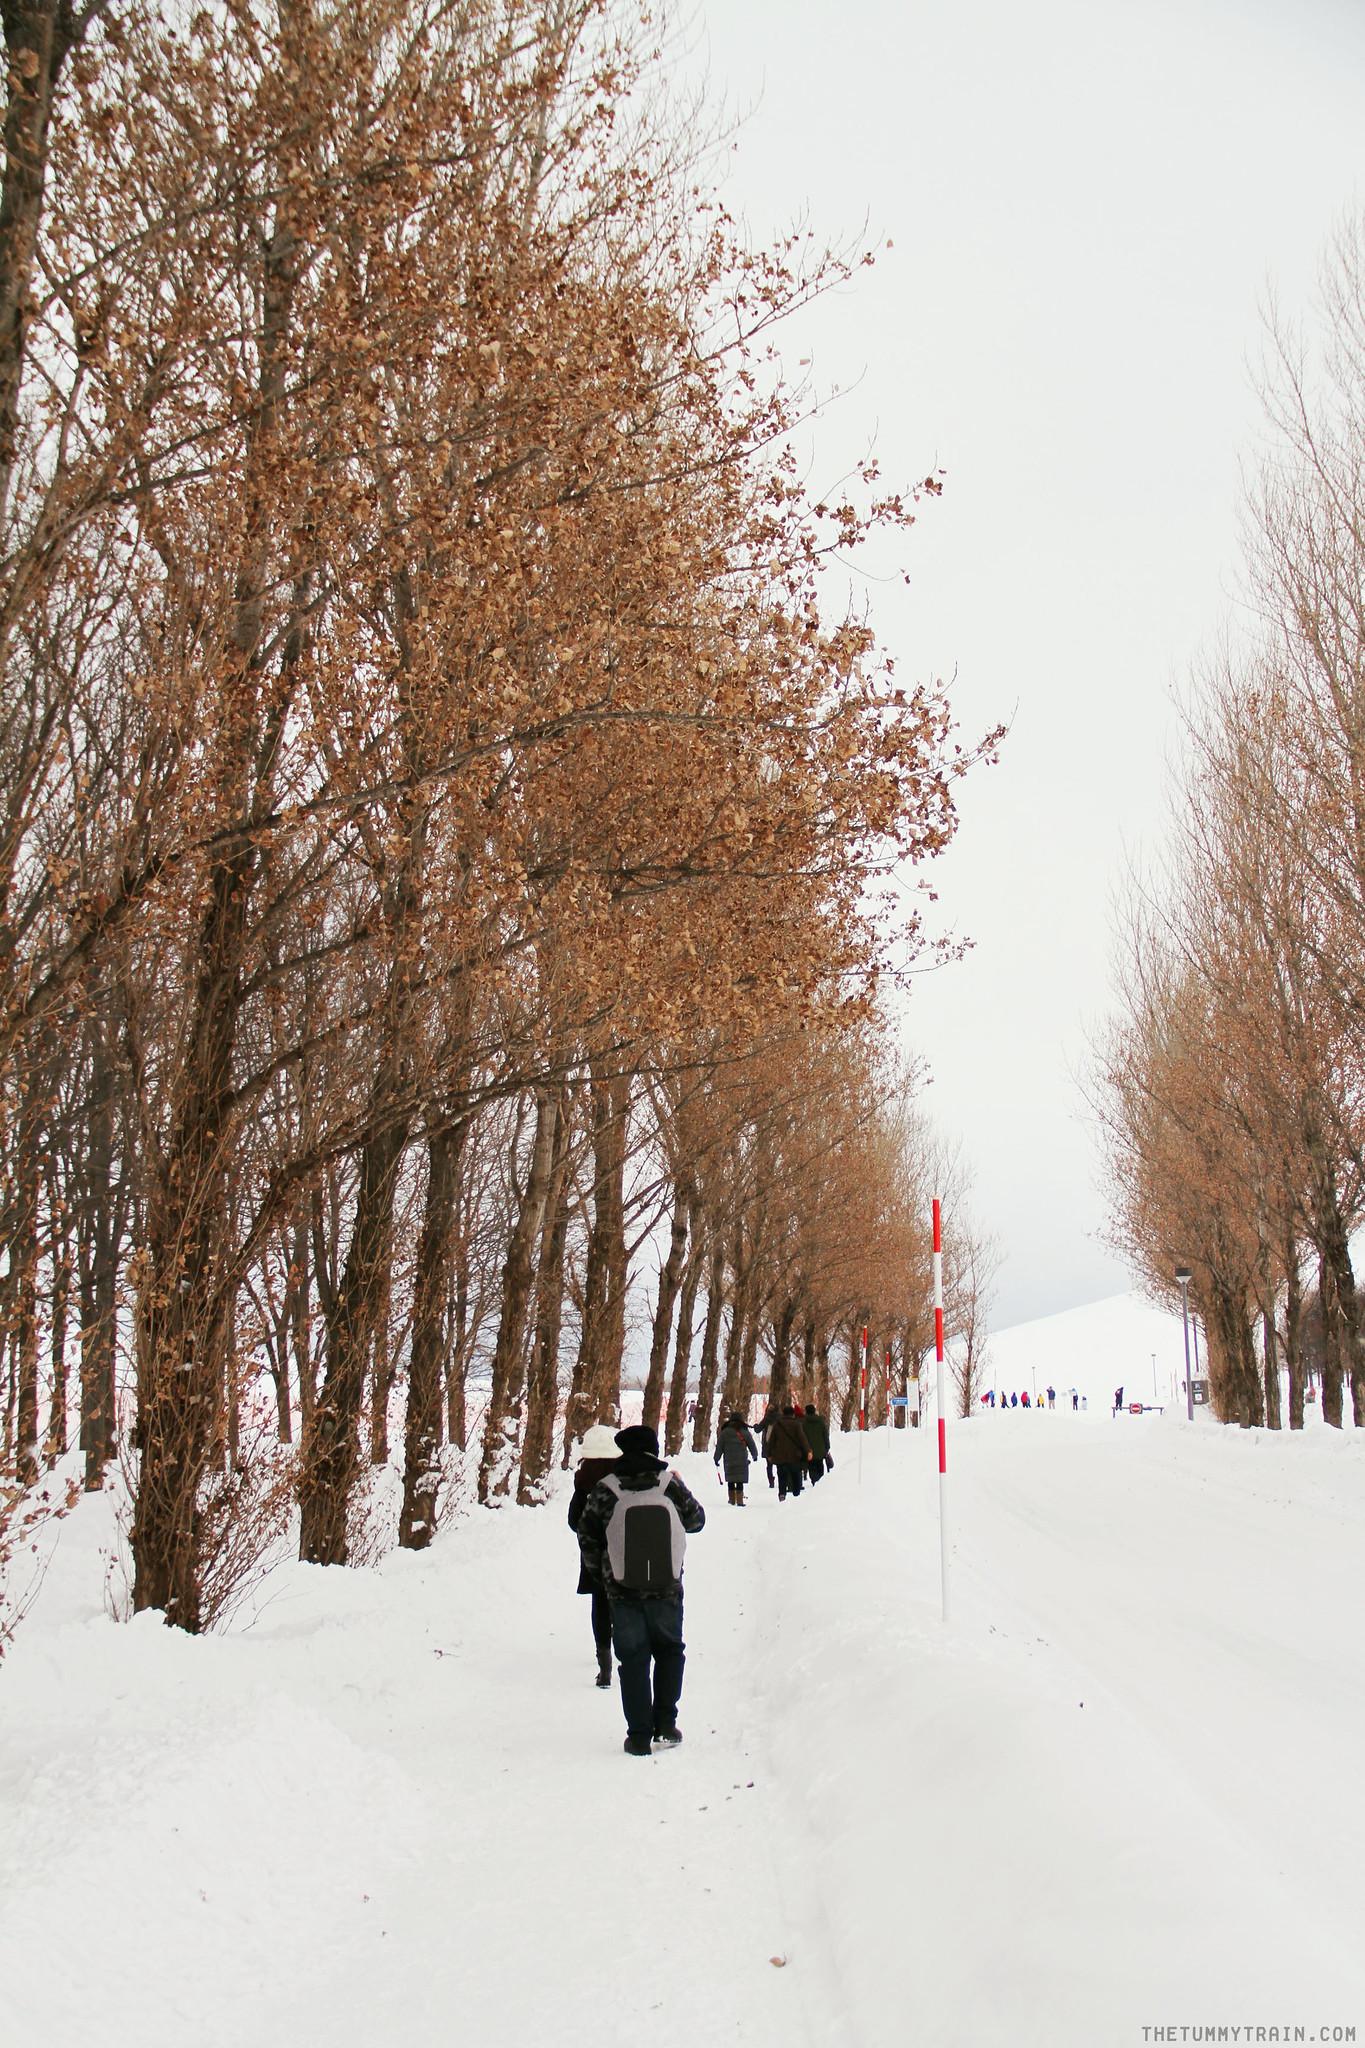 32875889666 cf0e840b6b k - Sapporo Travel Diary 2017: Having a grand old time at Moerenuma Park